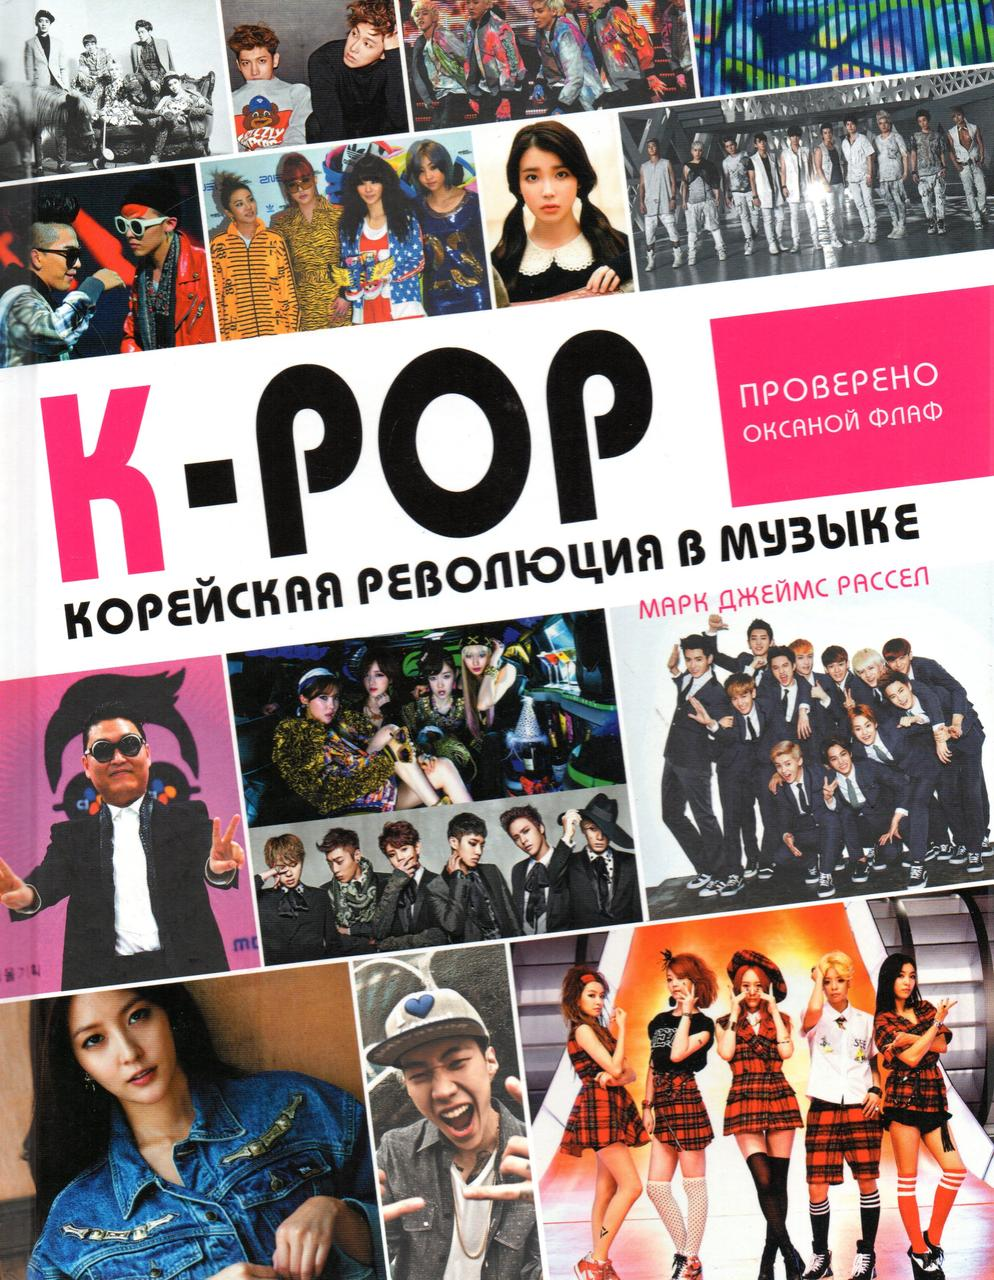 K-POP! Корейская революция в музыке. Марк Джеймс Рассел